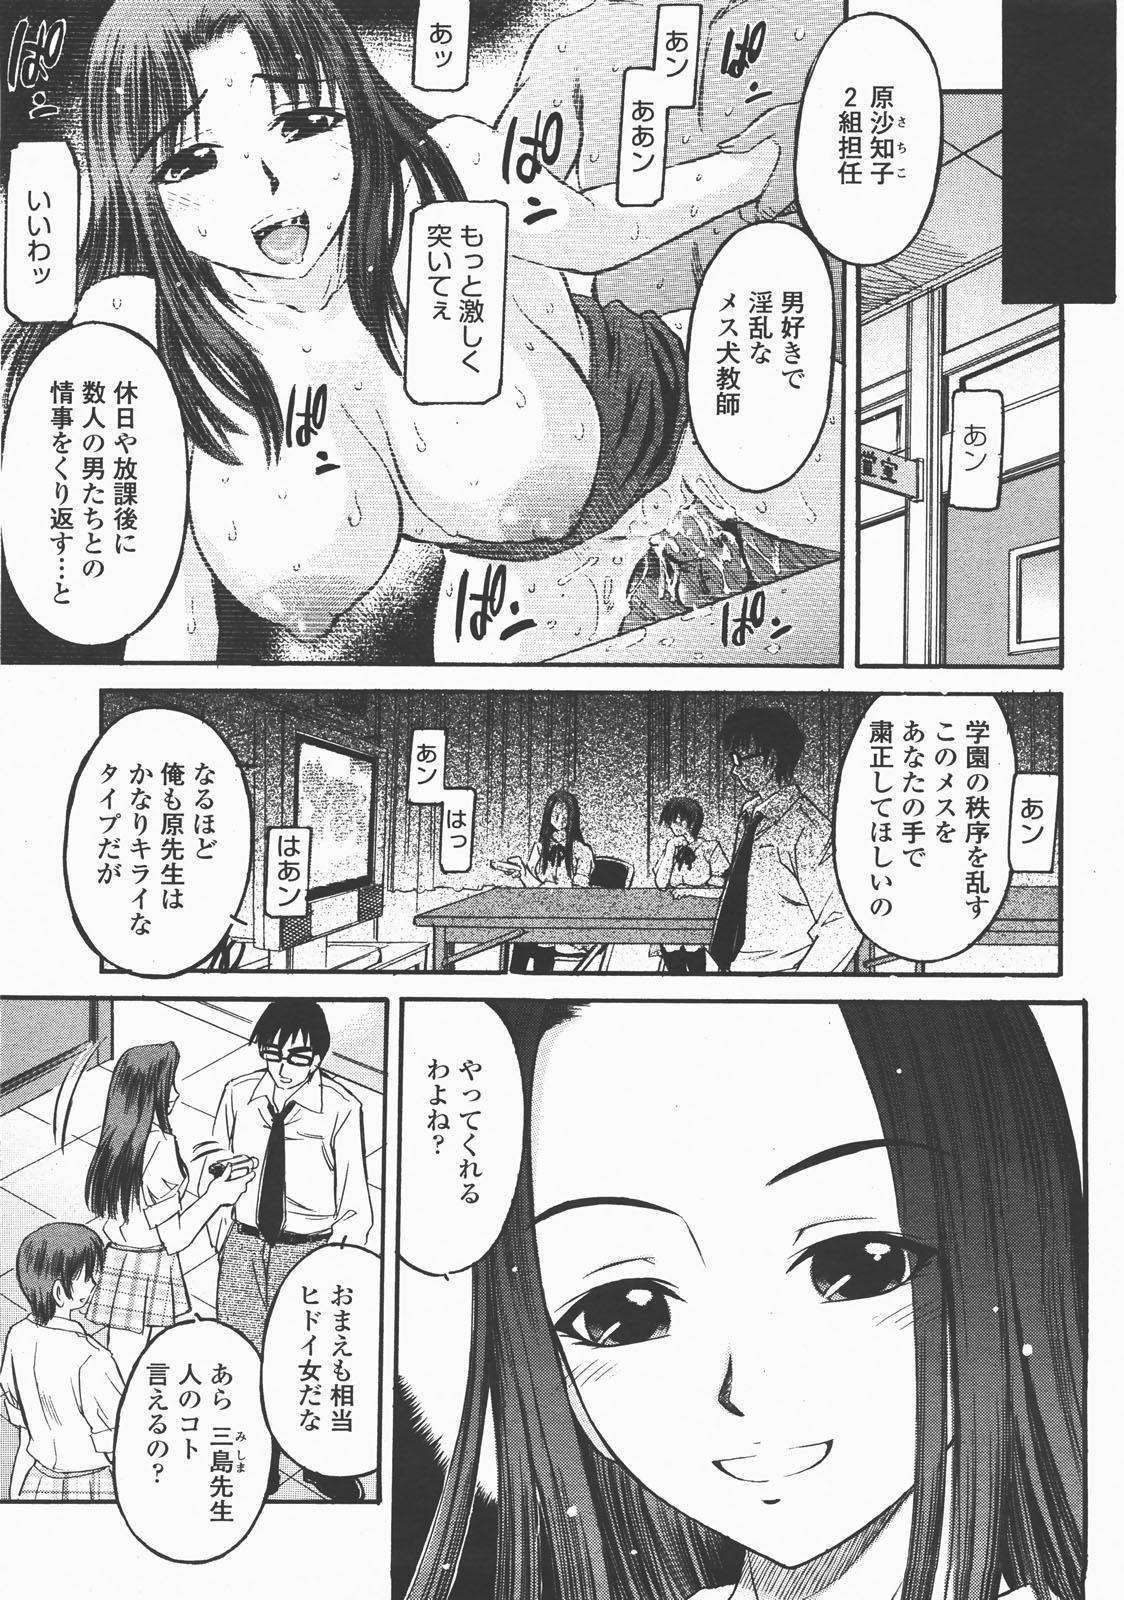 COMIC Momohime 2007-12 249